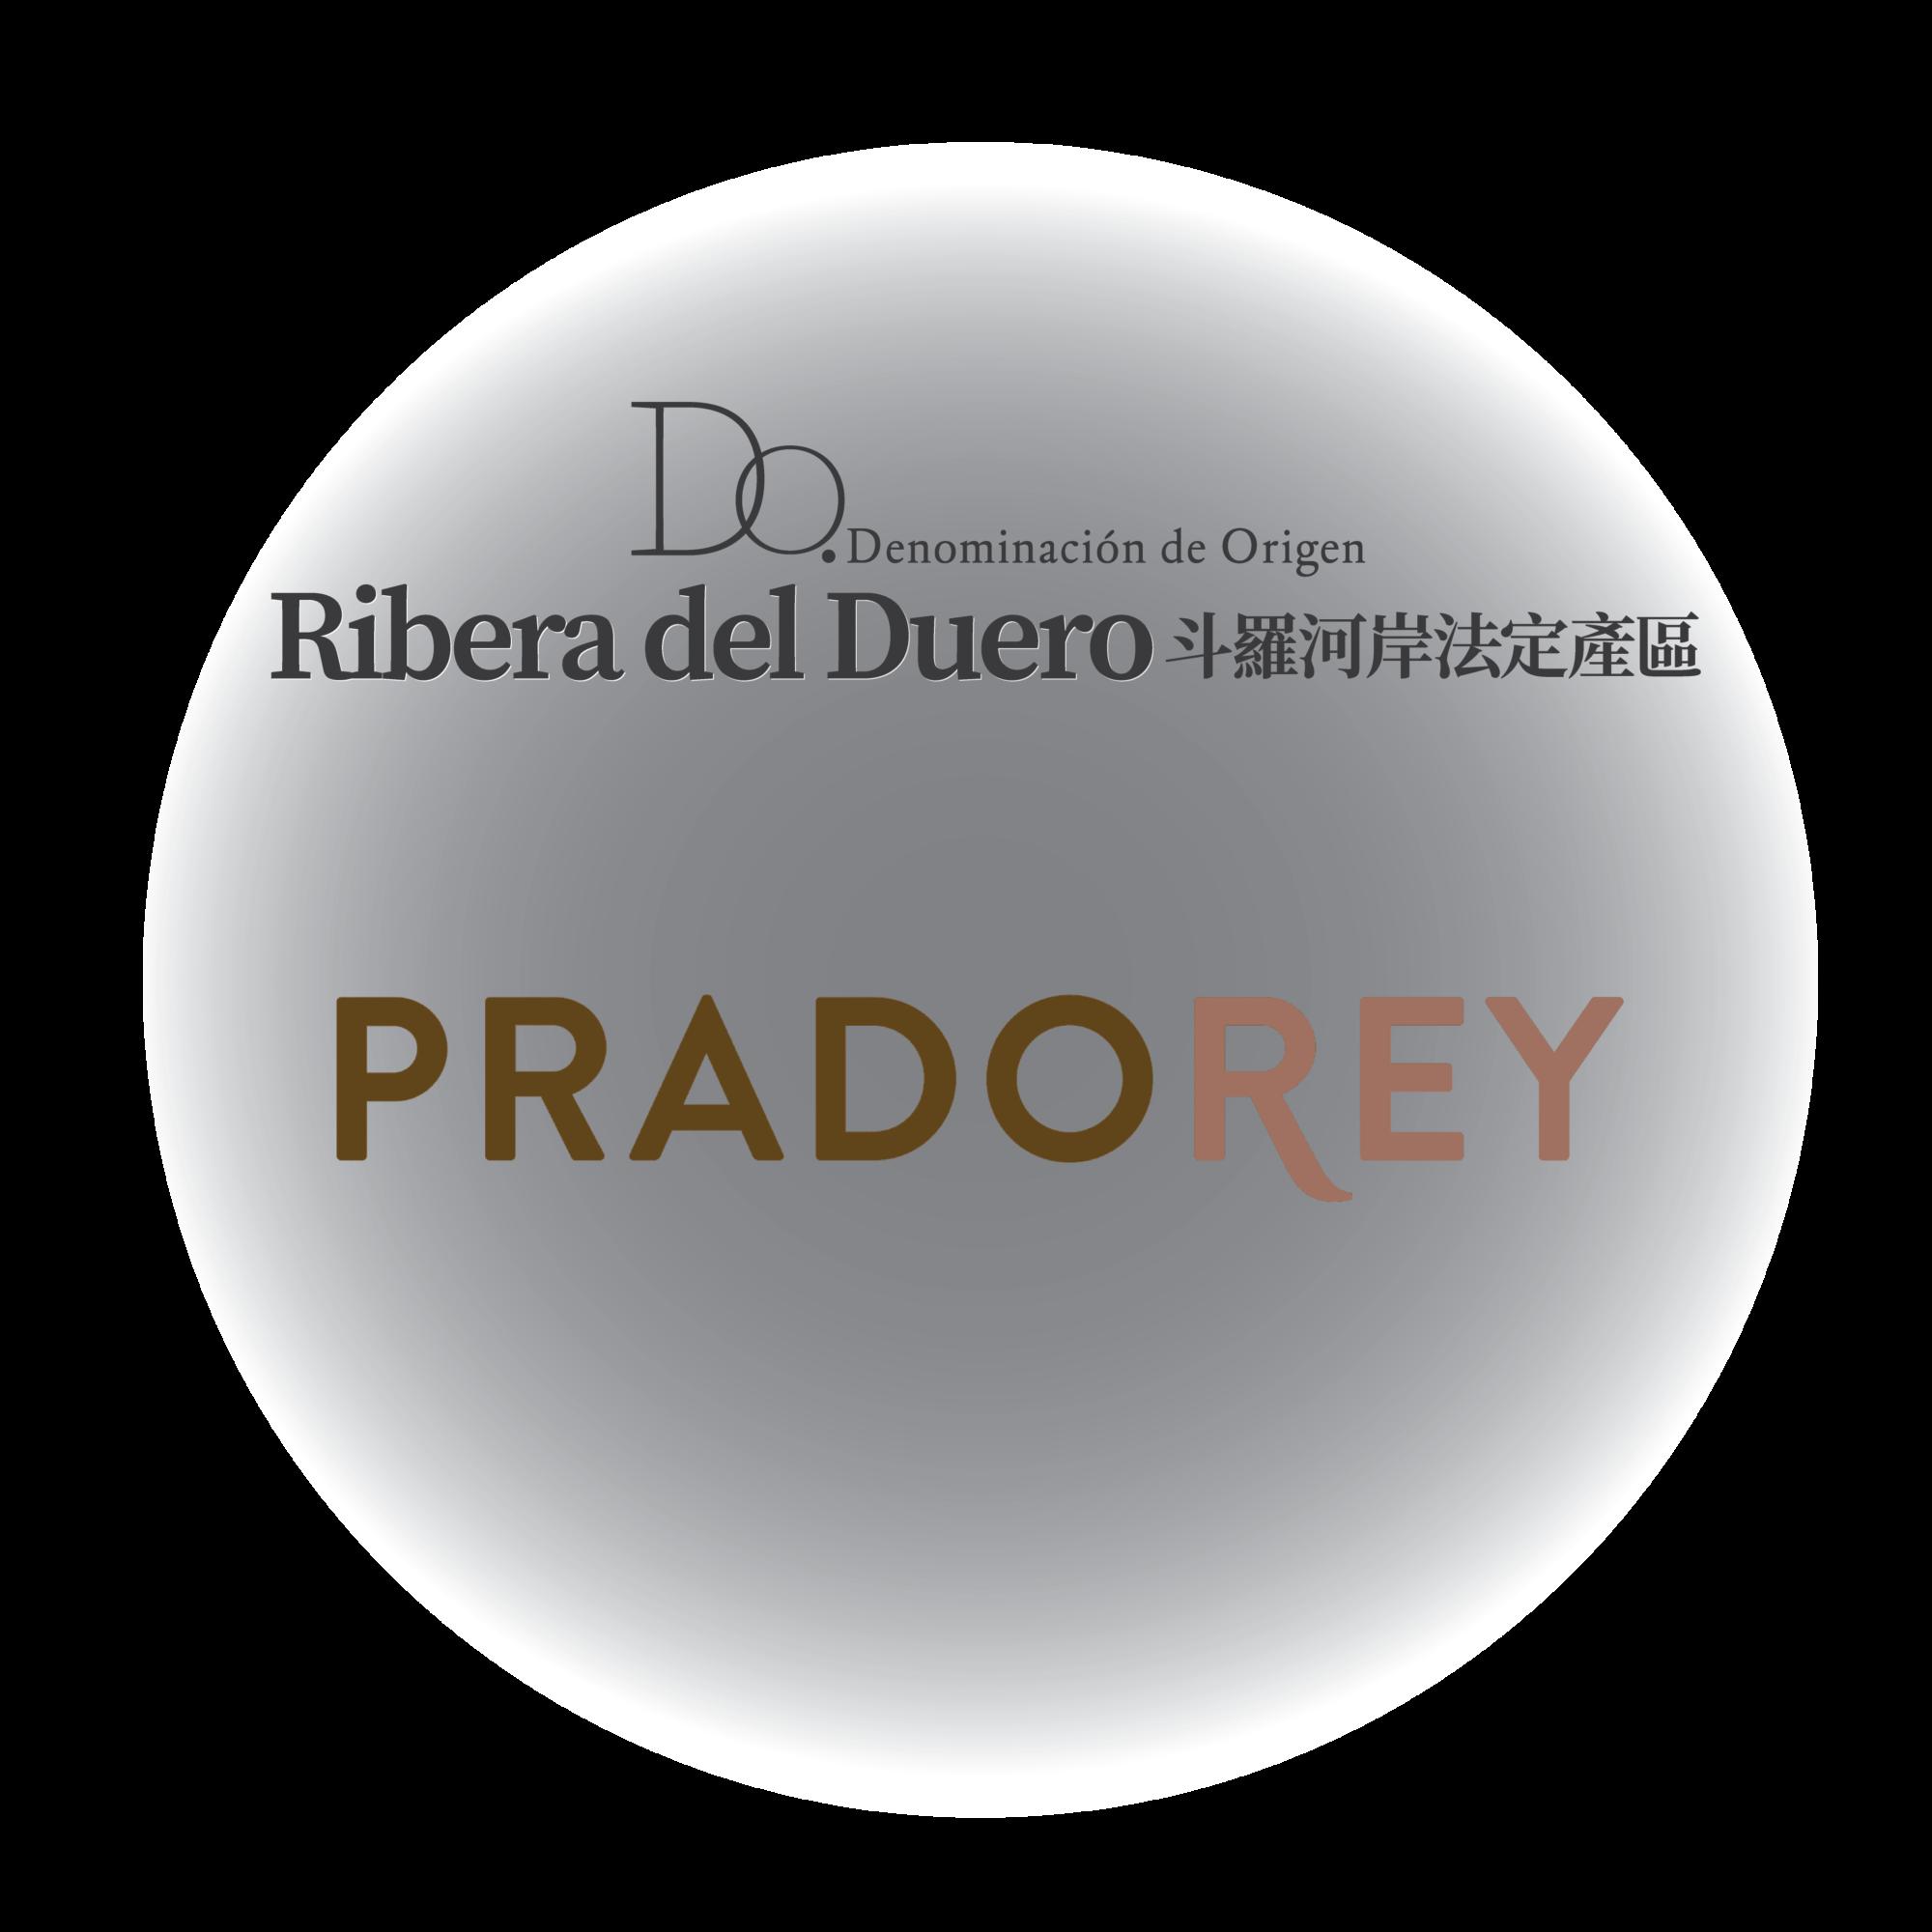 Bodega Pradorey